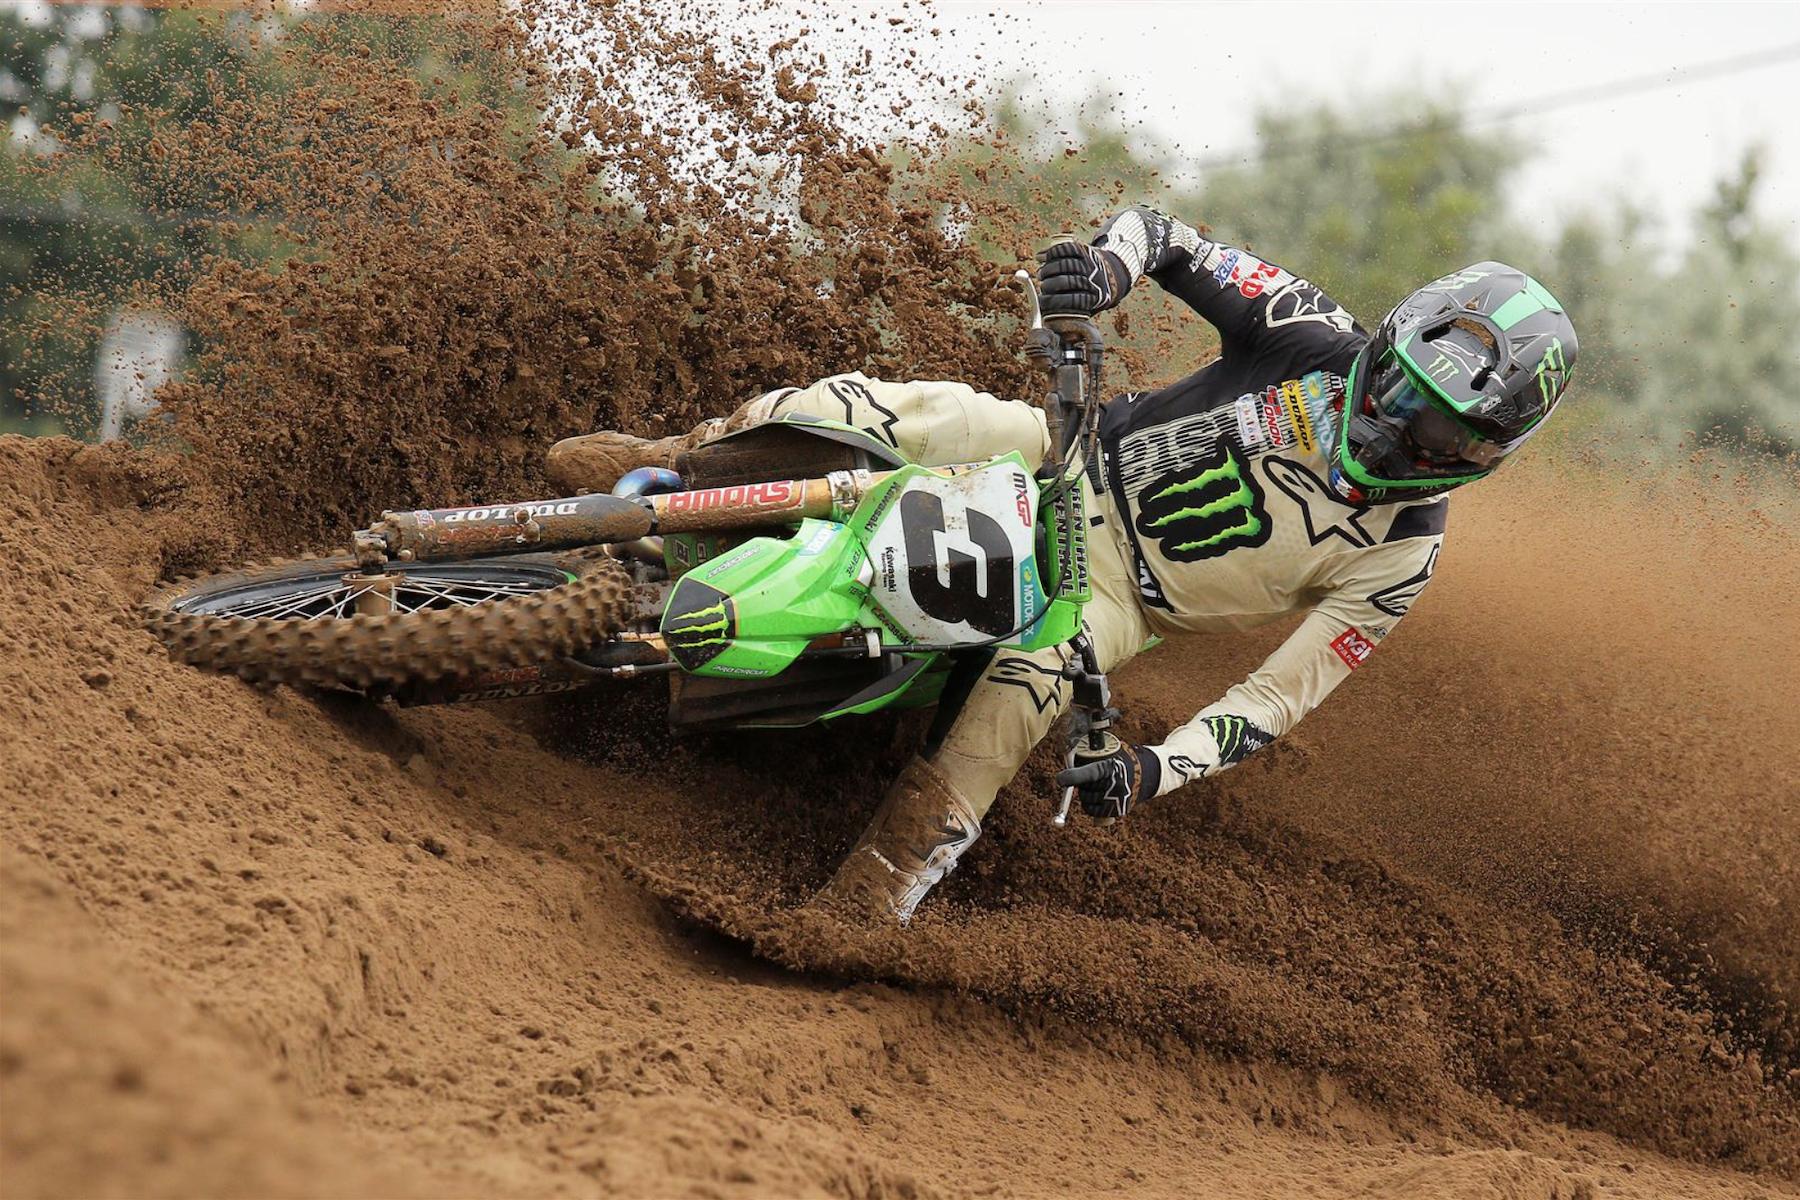 Dunlop riders on MXGP, WMX podiums in Belgium